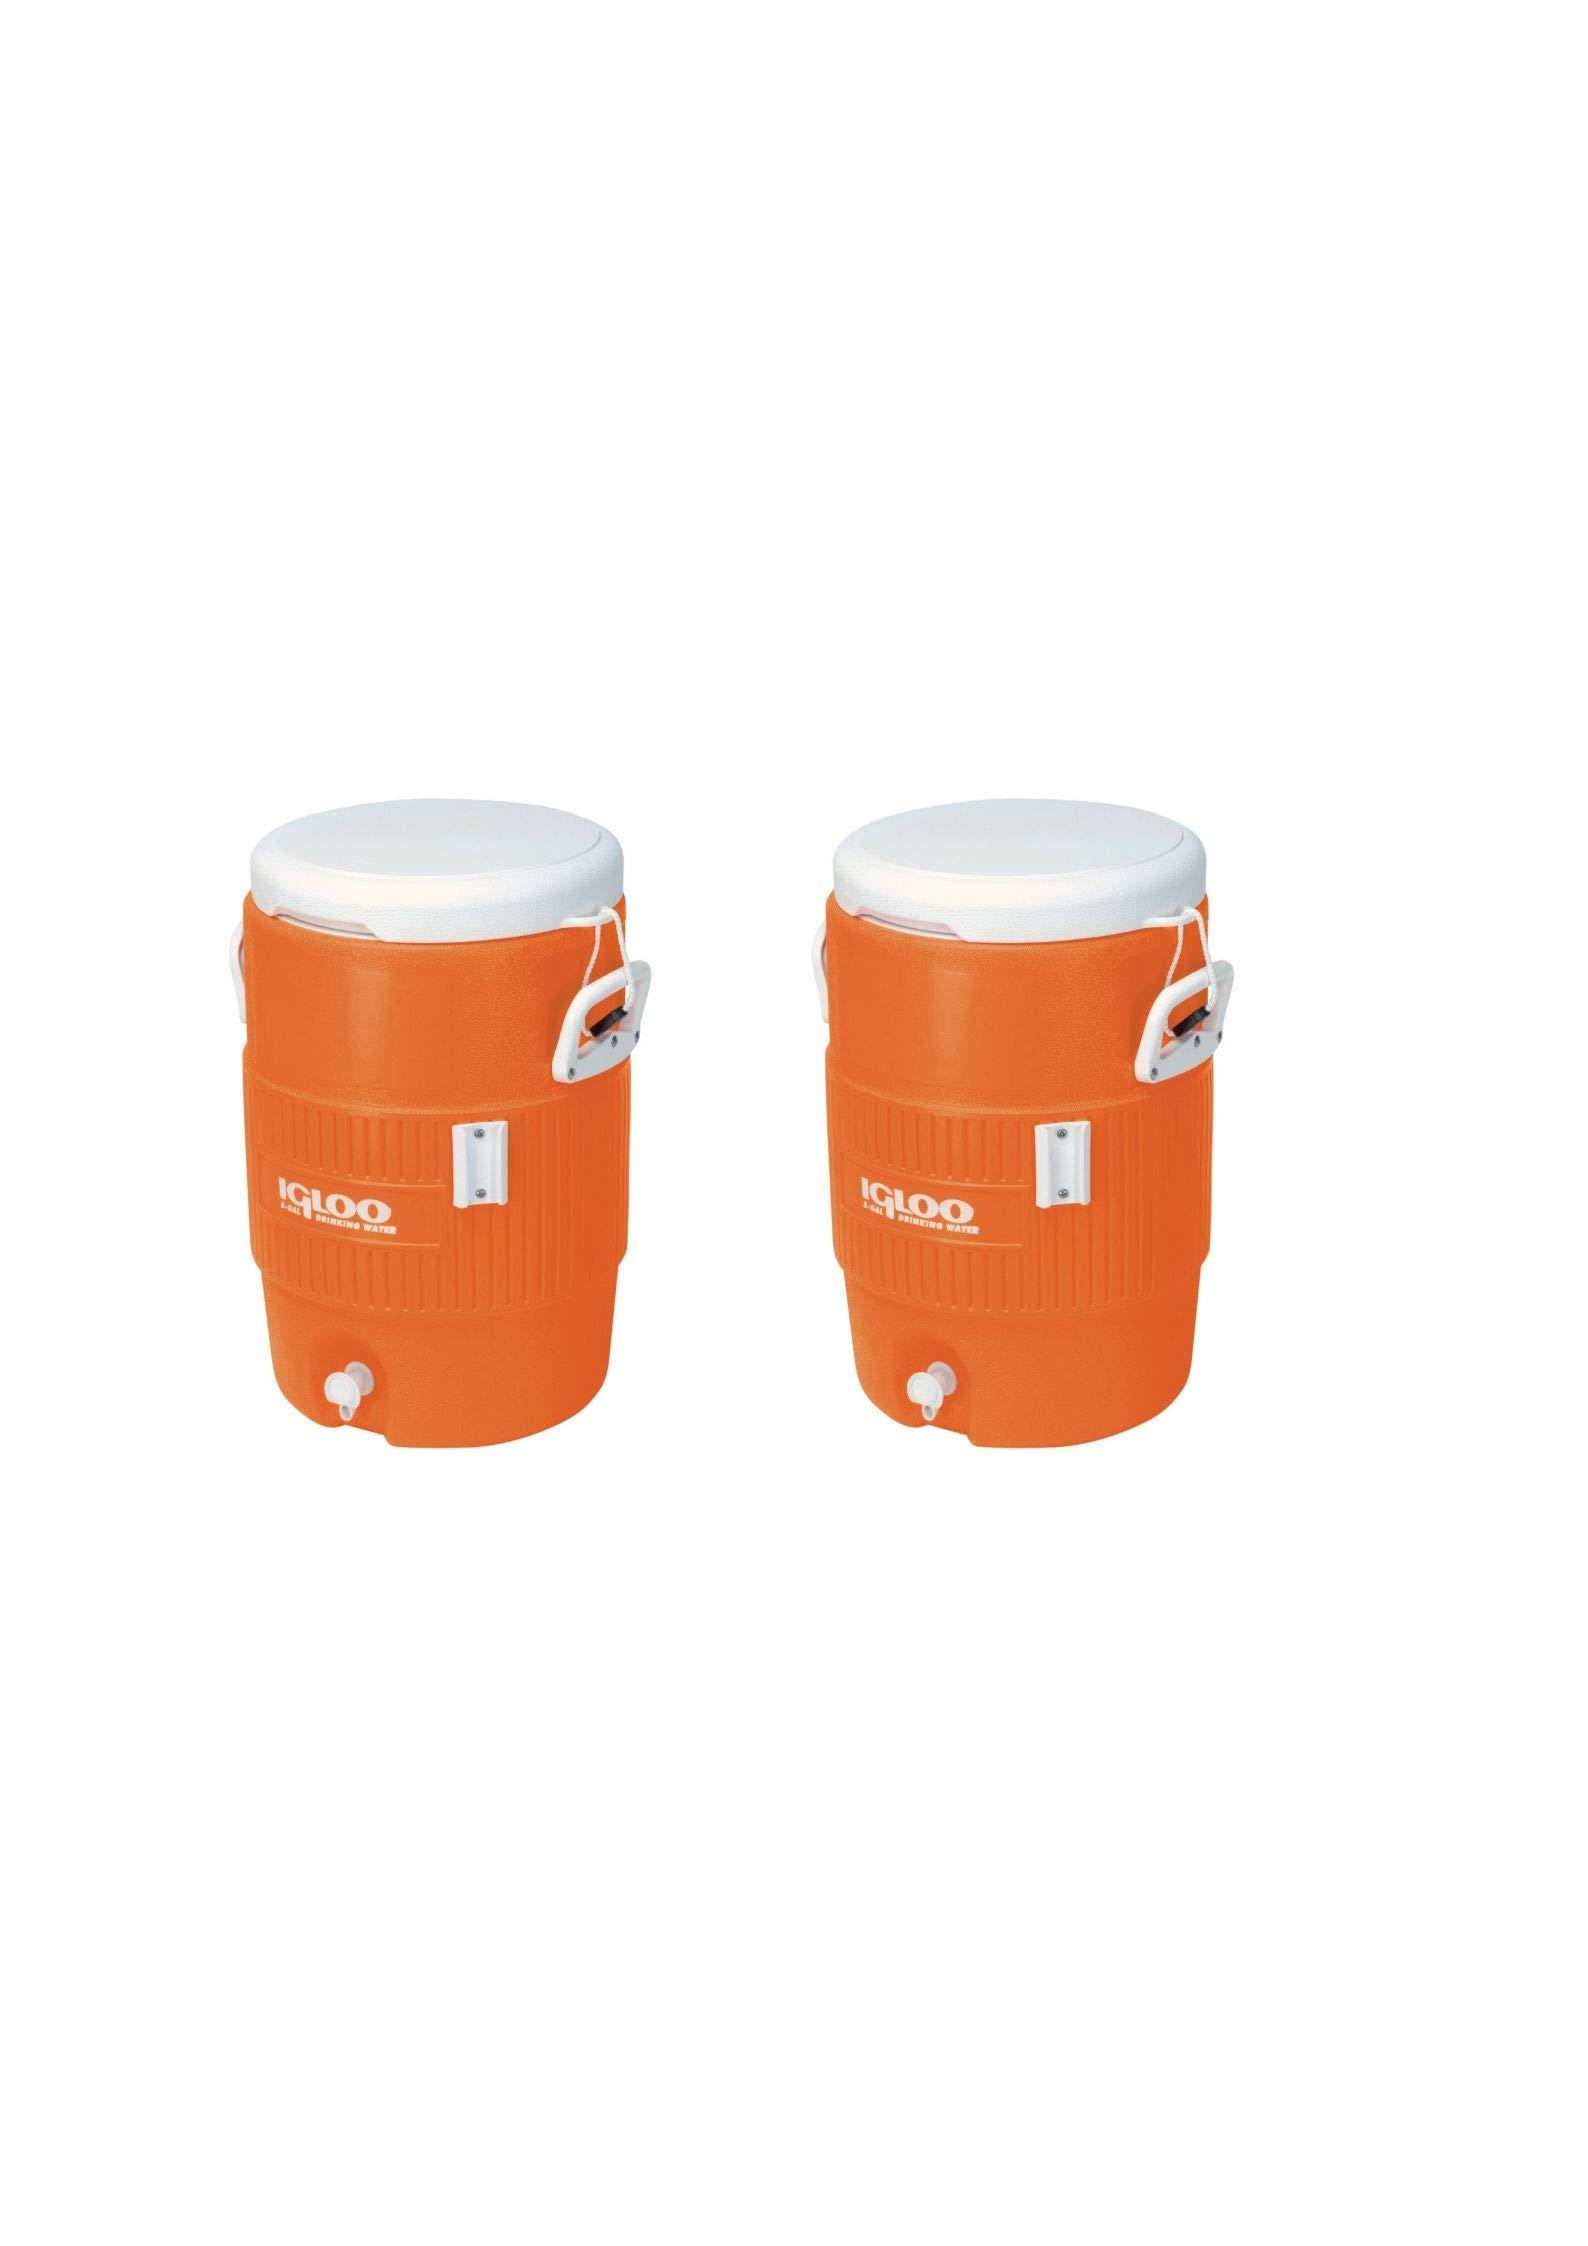 Igloo 5-Gallon Heavy-Duty Beverage Cooler, Orange (2 Pack,Orange)